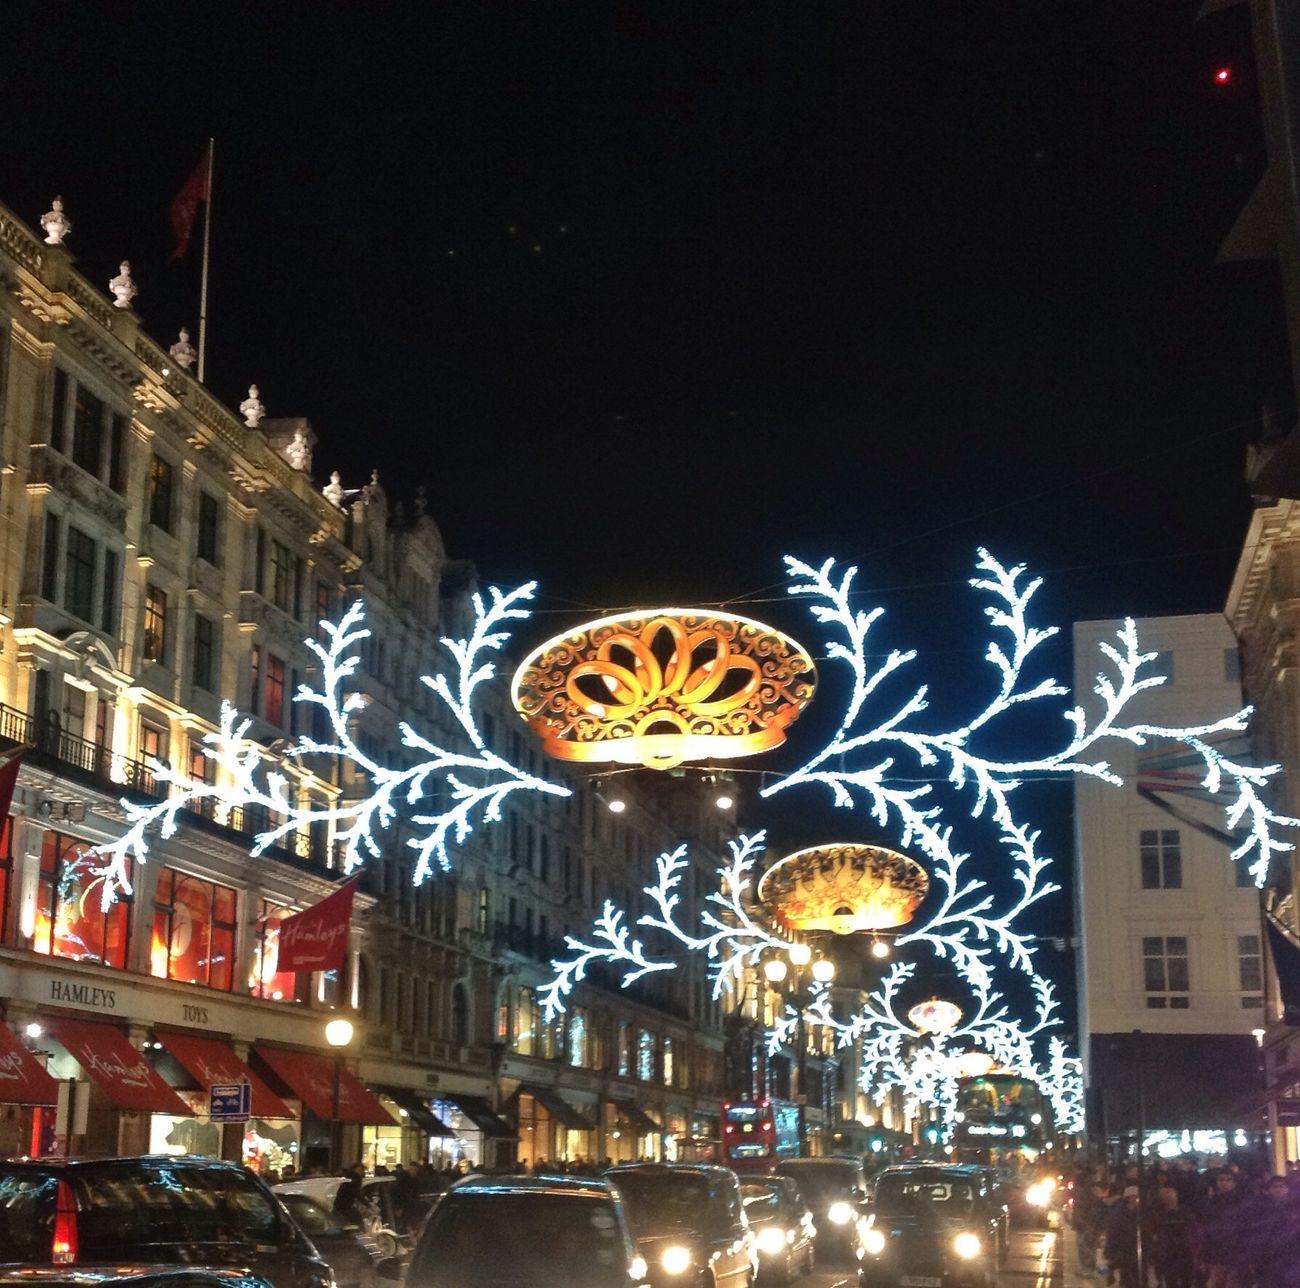 London Christmas Lights on Regentstreet Nightphotography